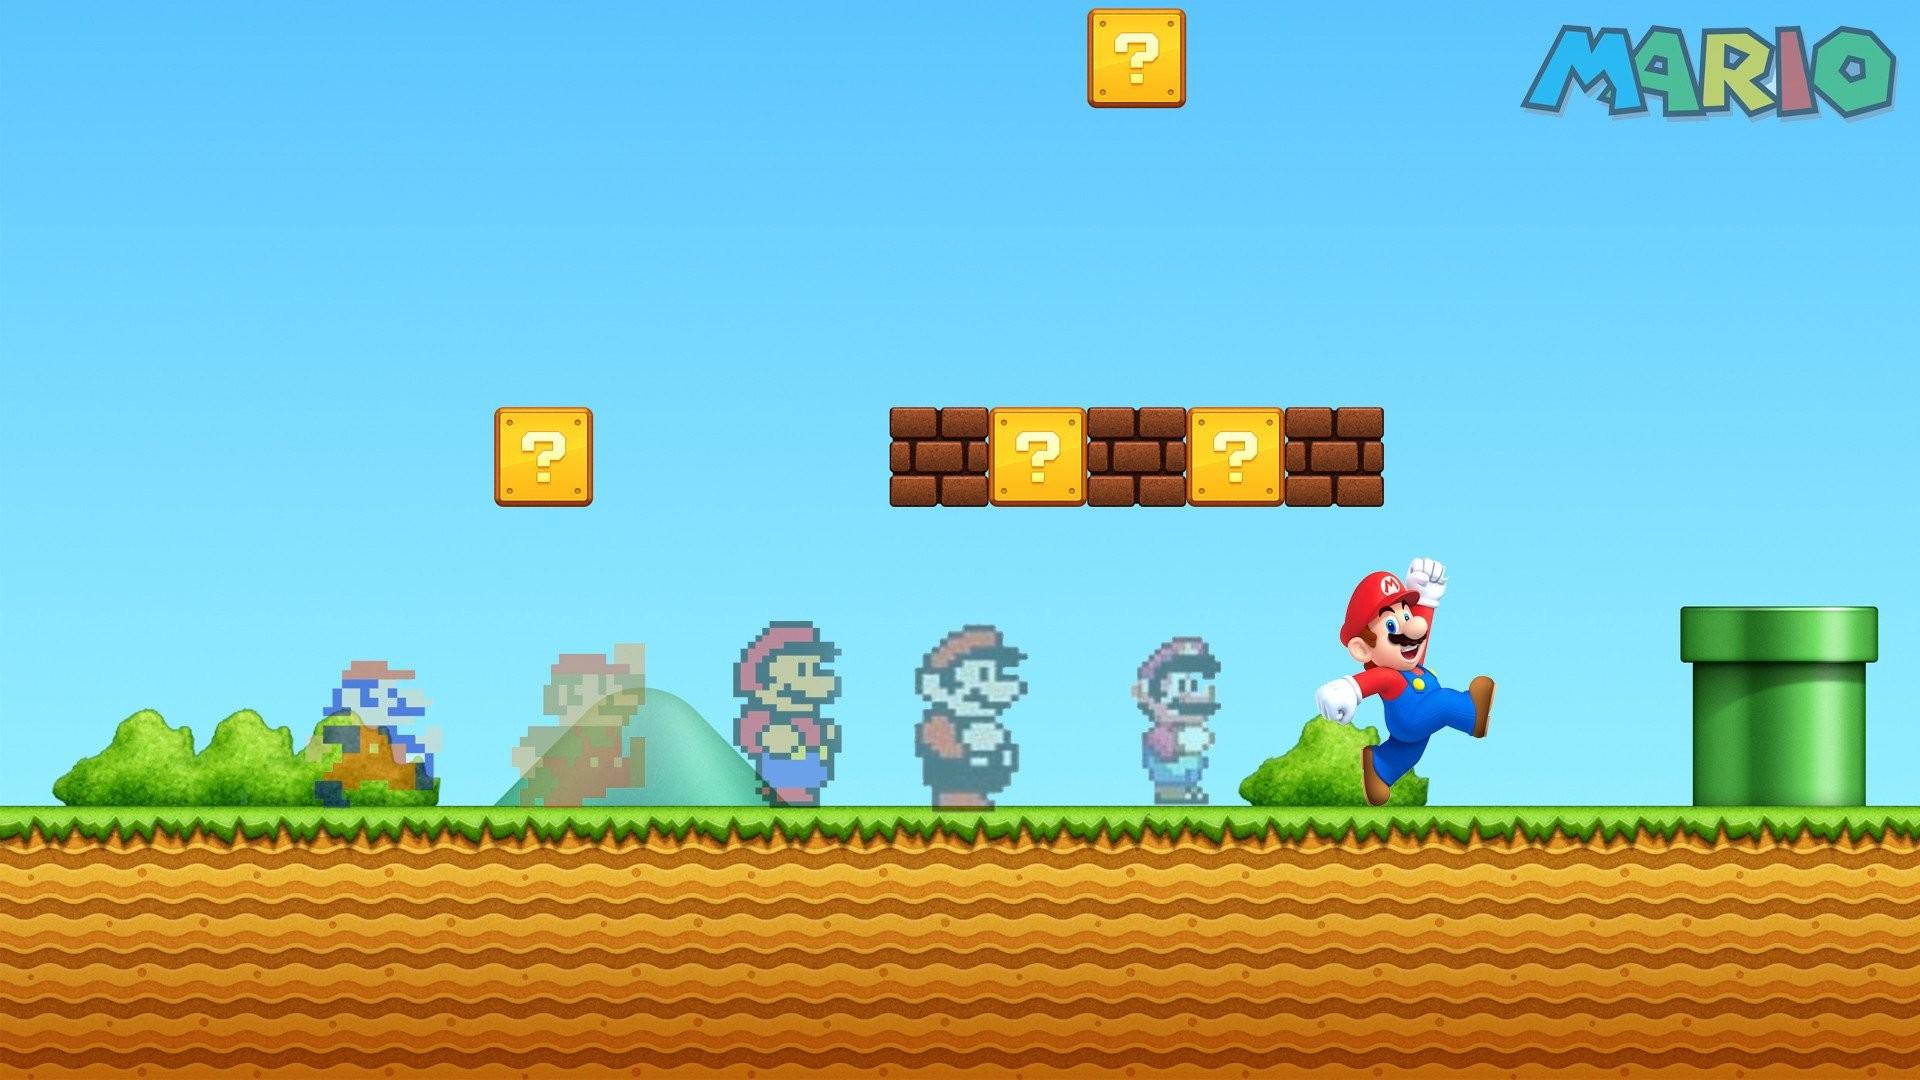 WallpapersWide.com   Mario HD Desktop Wallpapers for Widescreen .